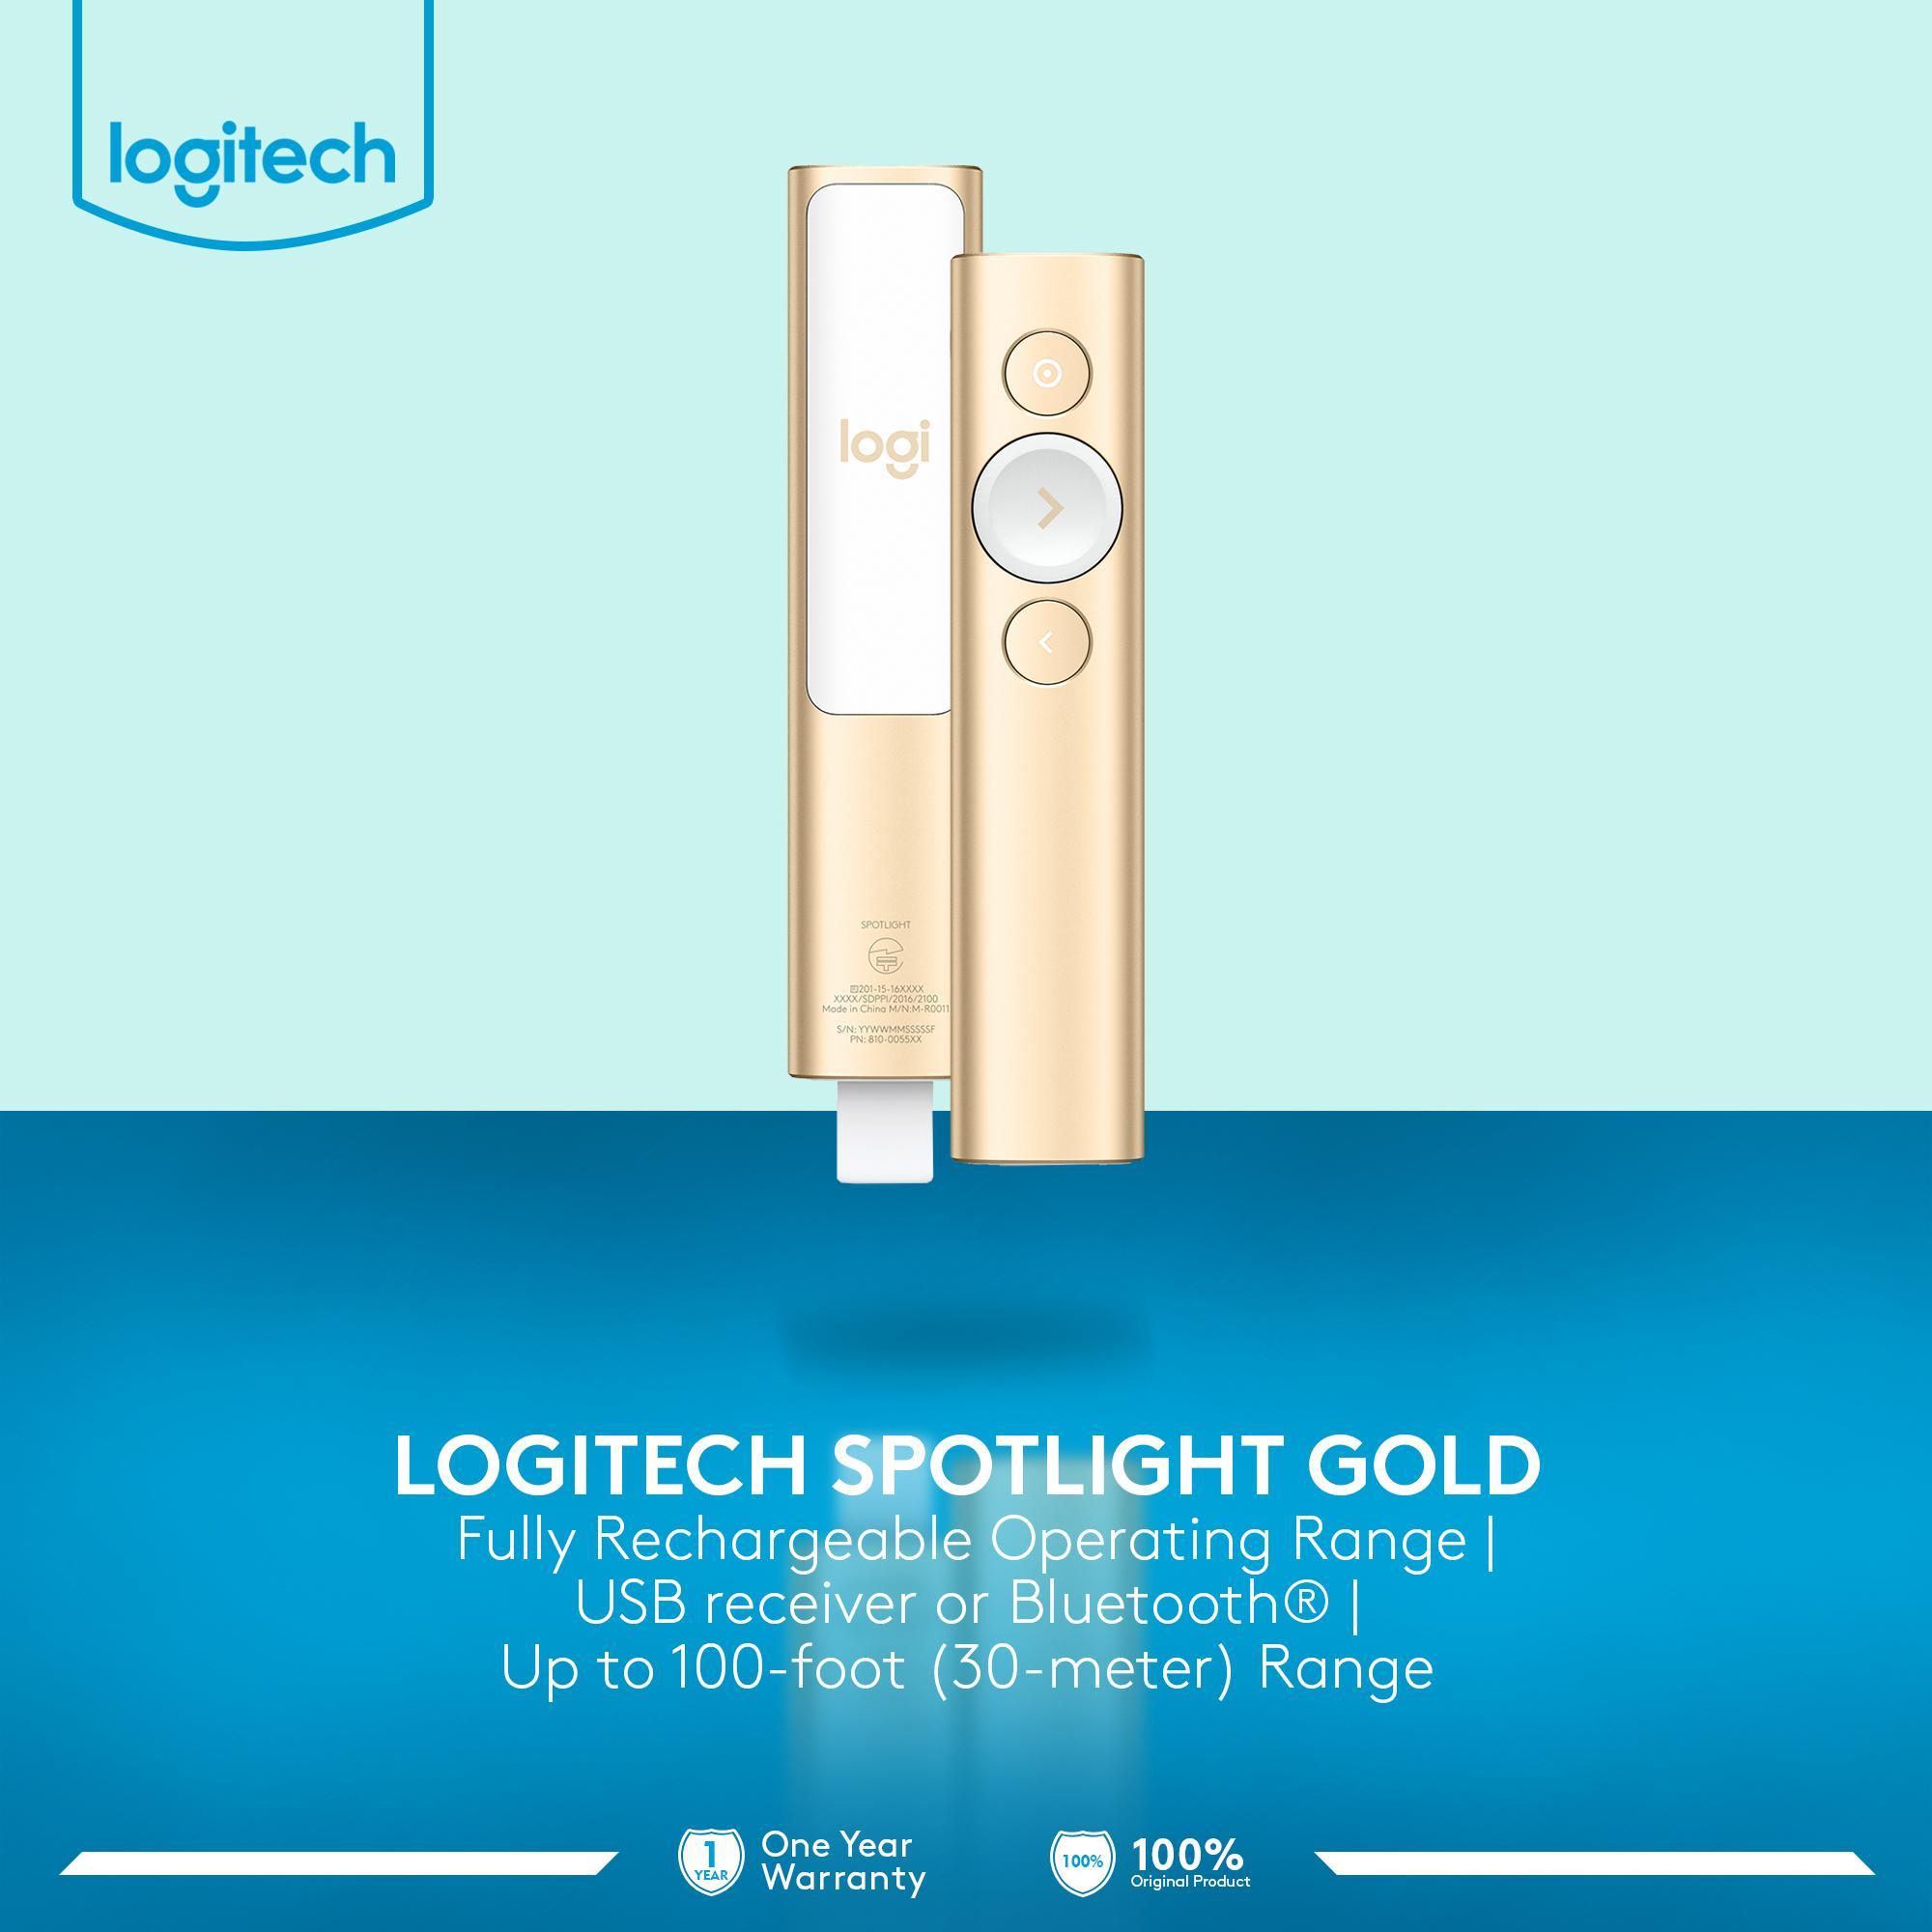 Kelebihan Logitech Spotlight Alat Presentasi Remote Wireless Laser Pointer Pp1000 Presenter Pp 1000 1 Penilaian Gold